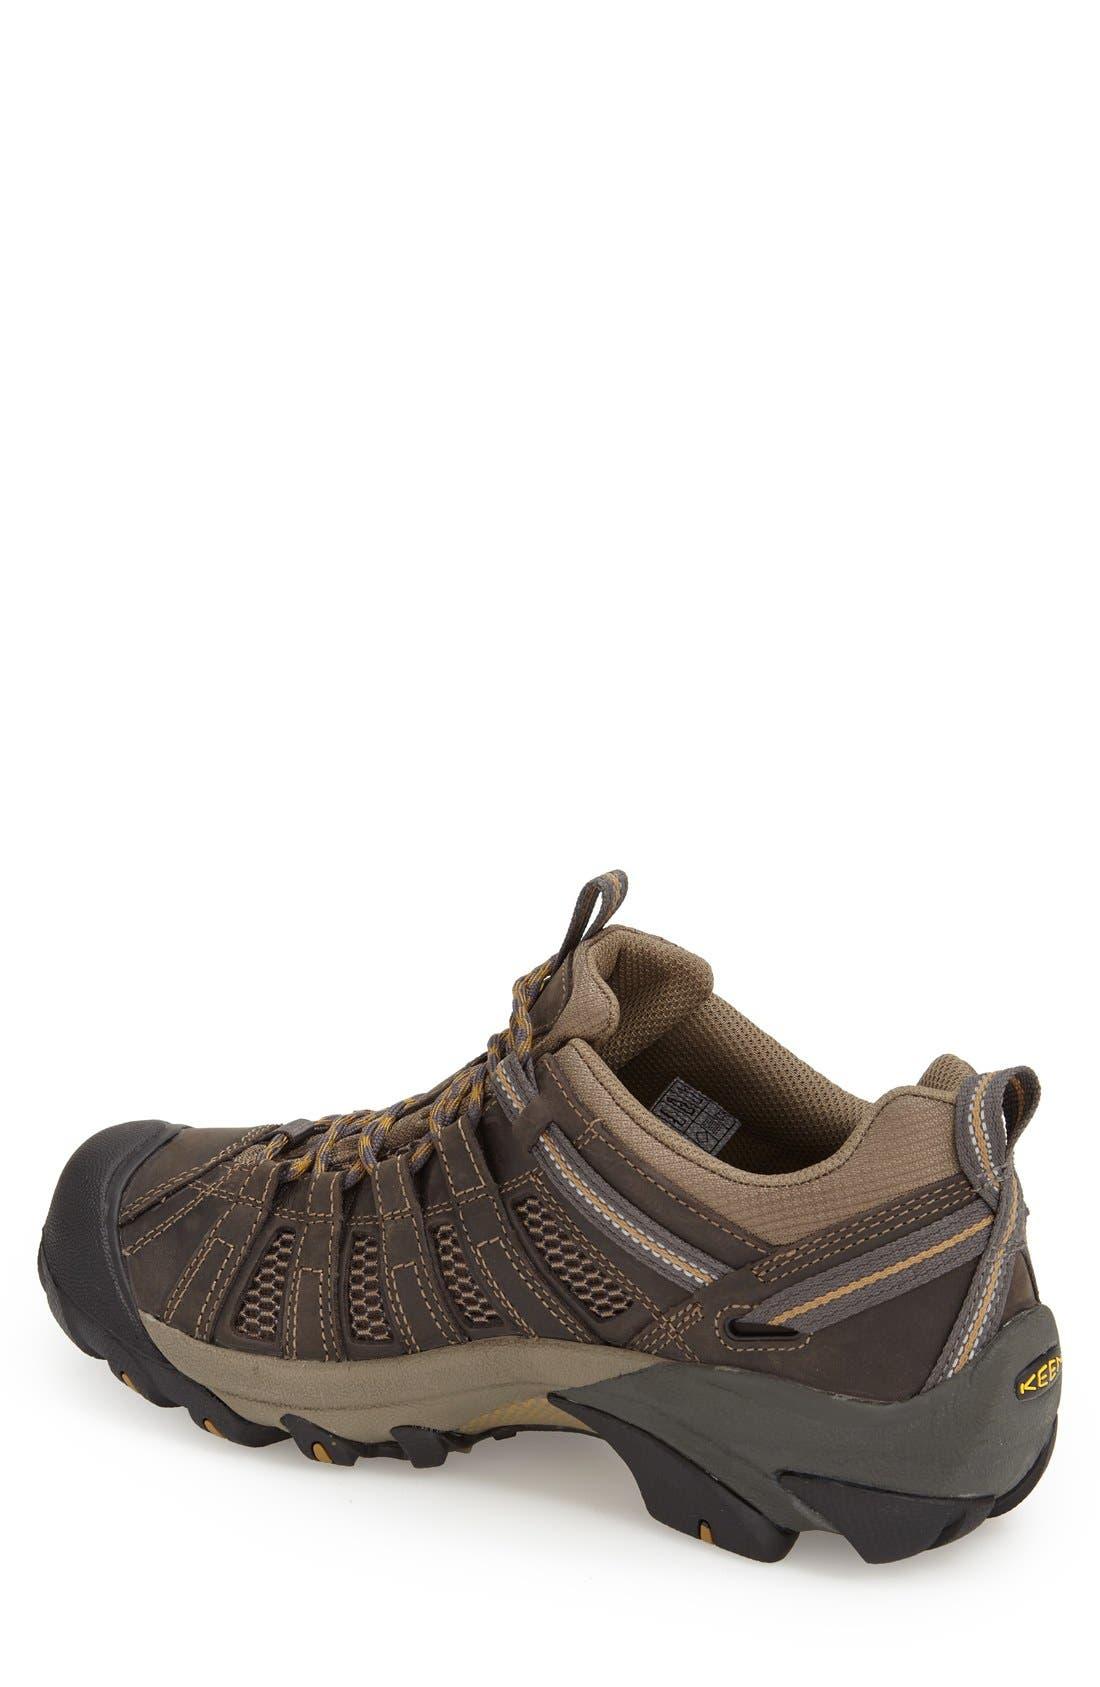 'Voyageur' Hiking Shoe,                             Alternate thumbnail 2, color,                             011